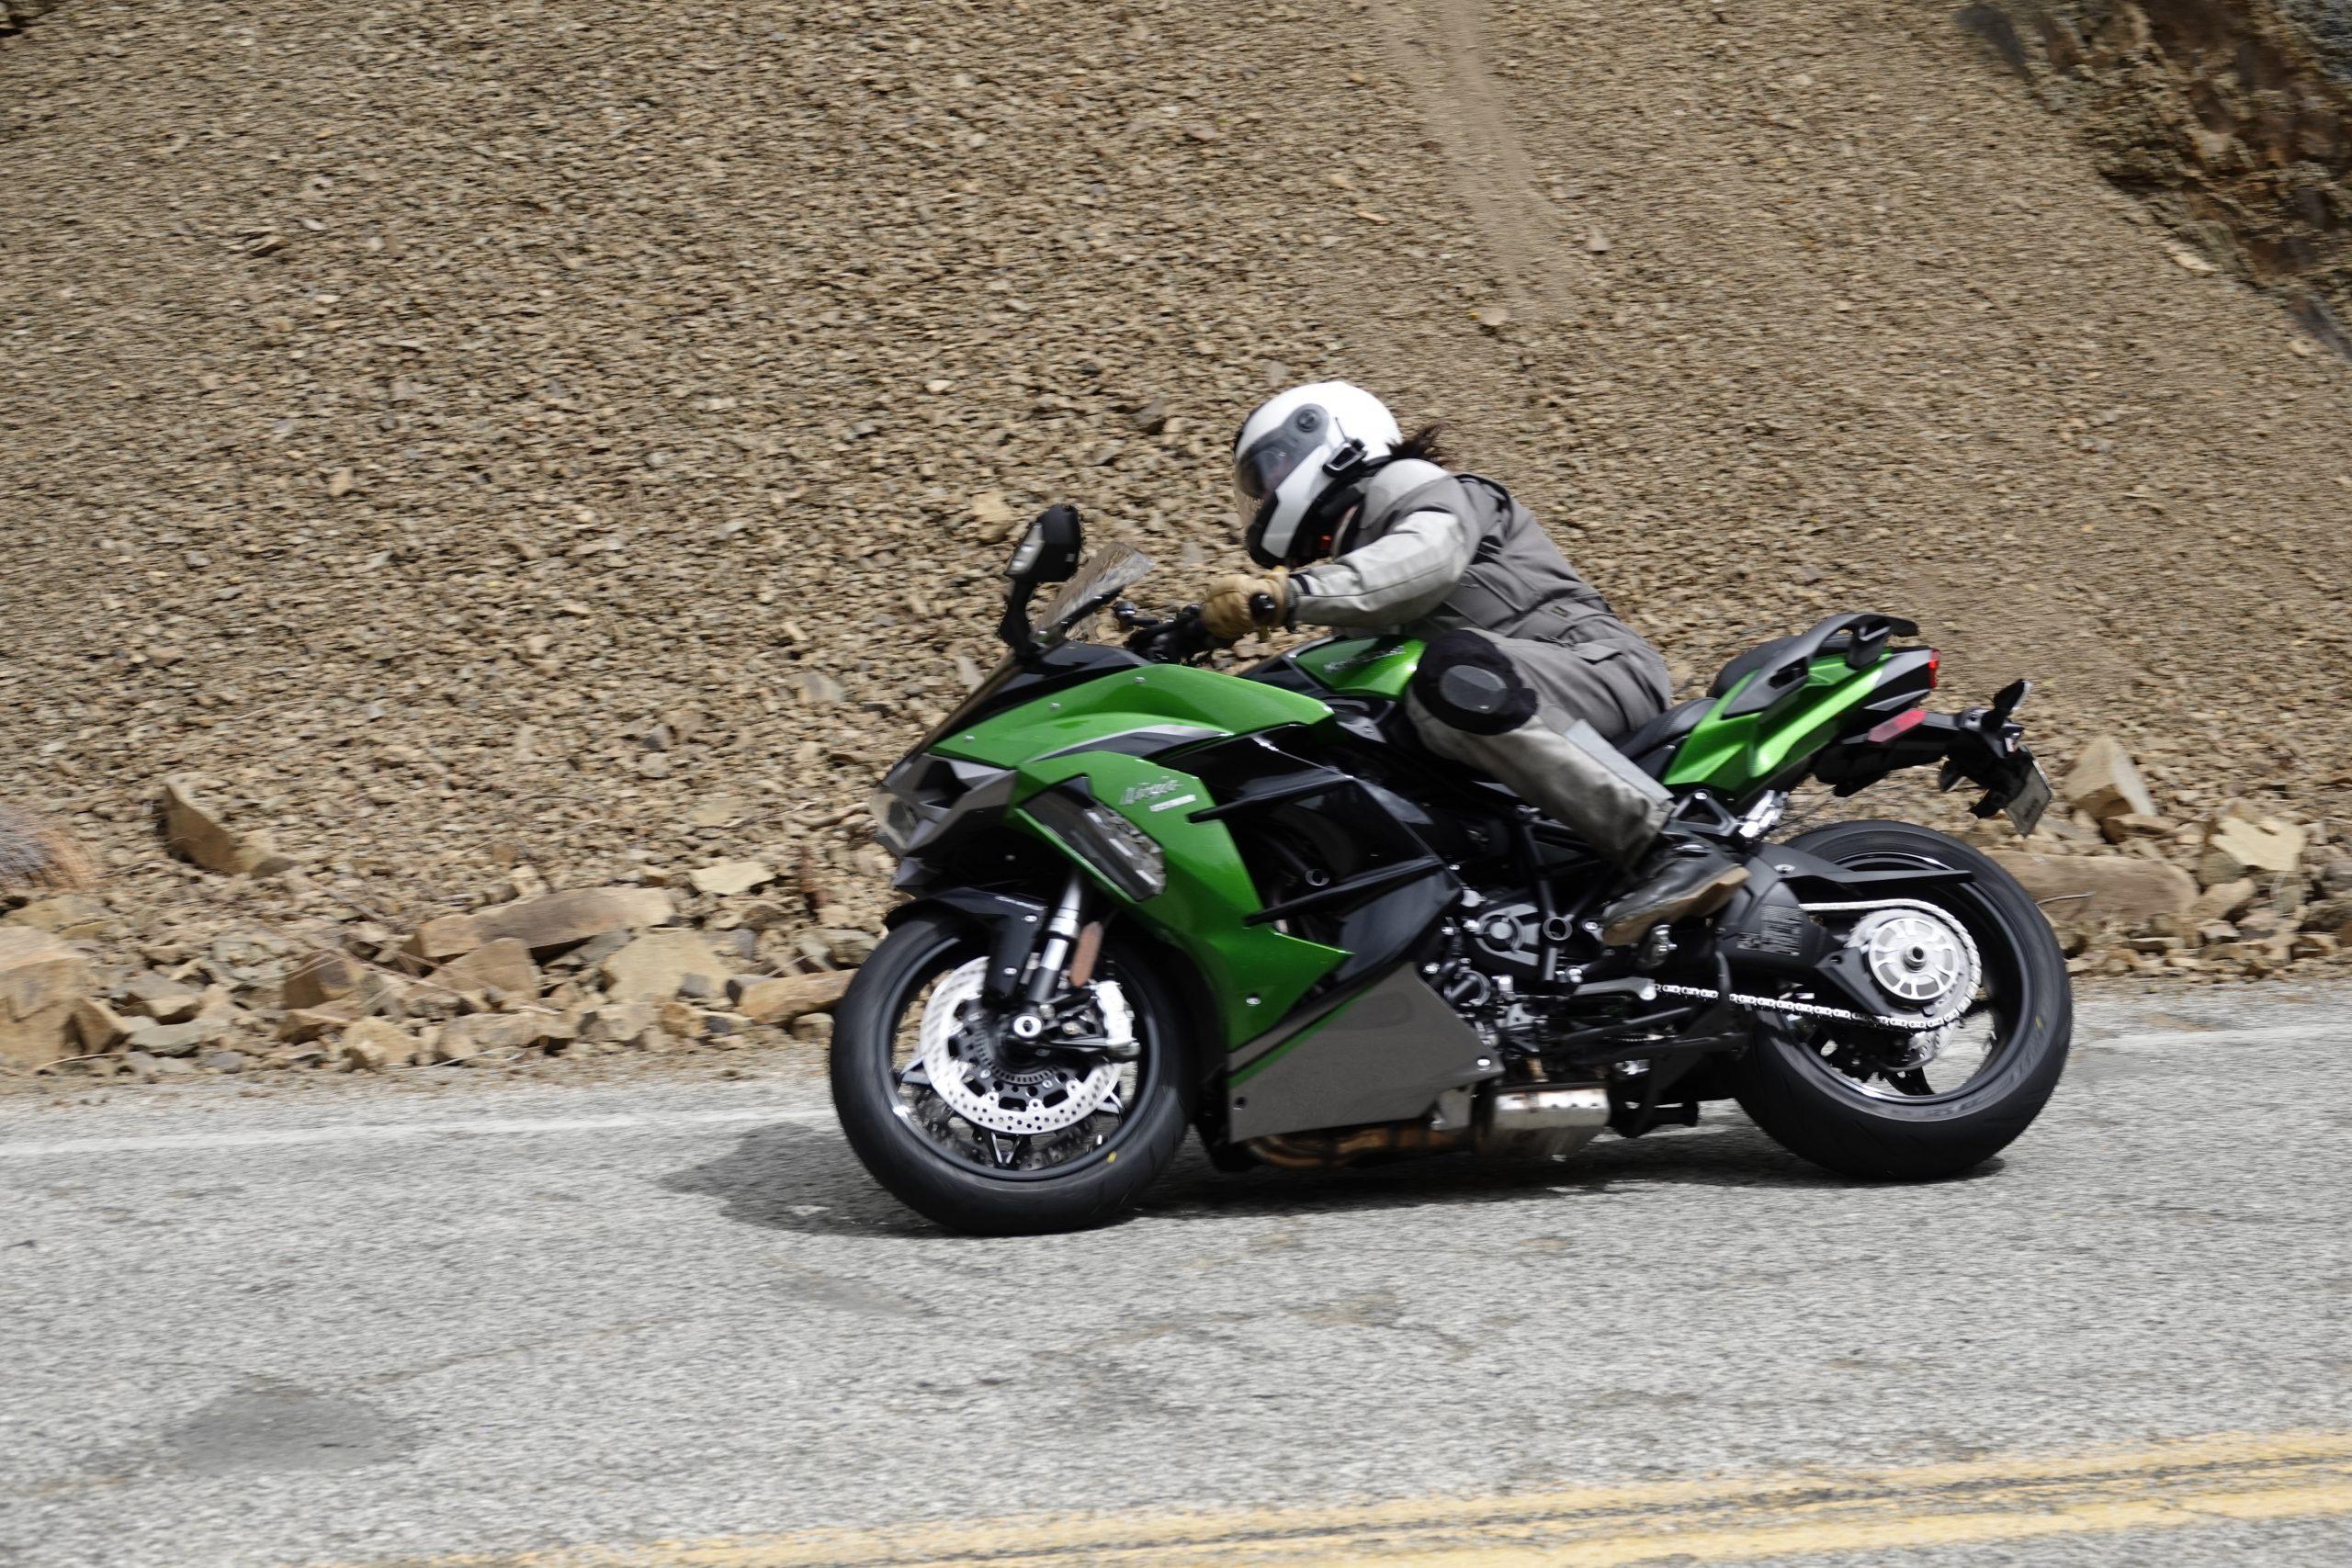 2021 Kawasaki H2 SX-SE side profile action